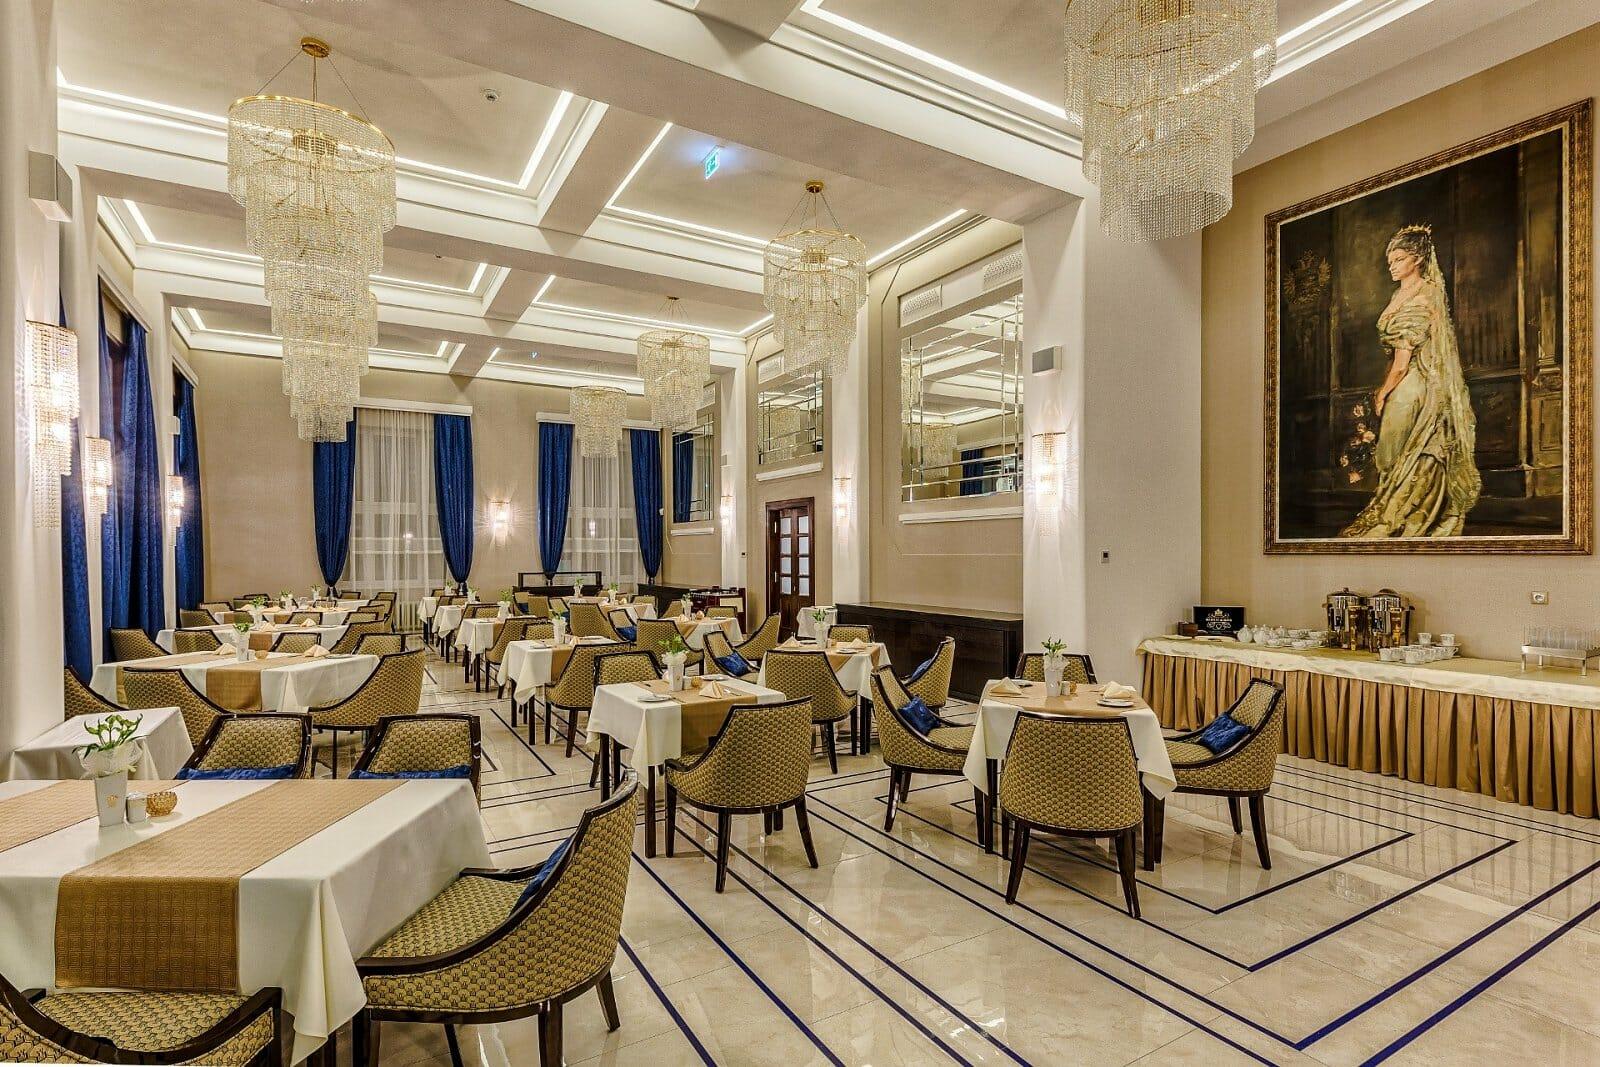 Reštaurácia Sisi, Turčianske Teplice